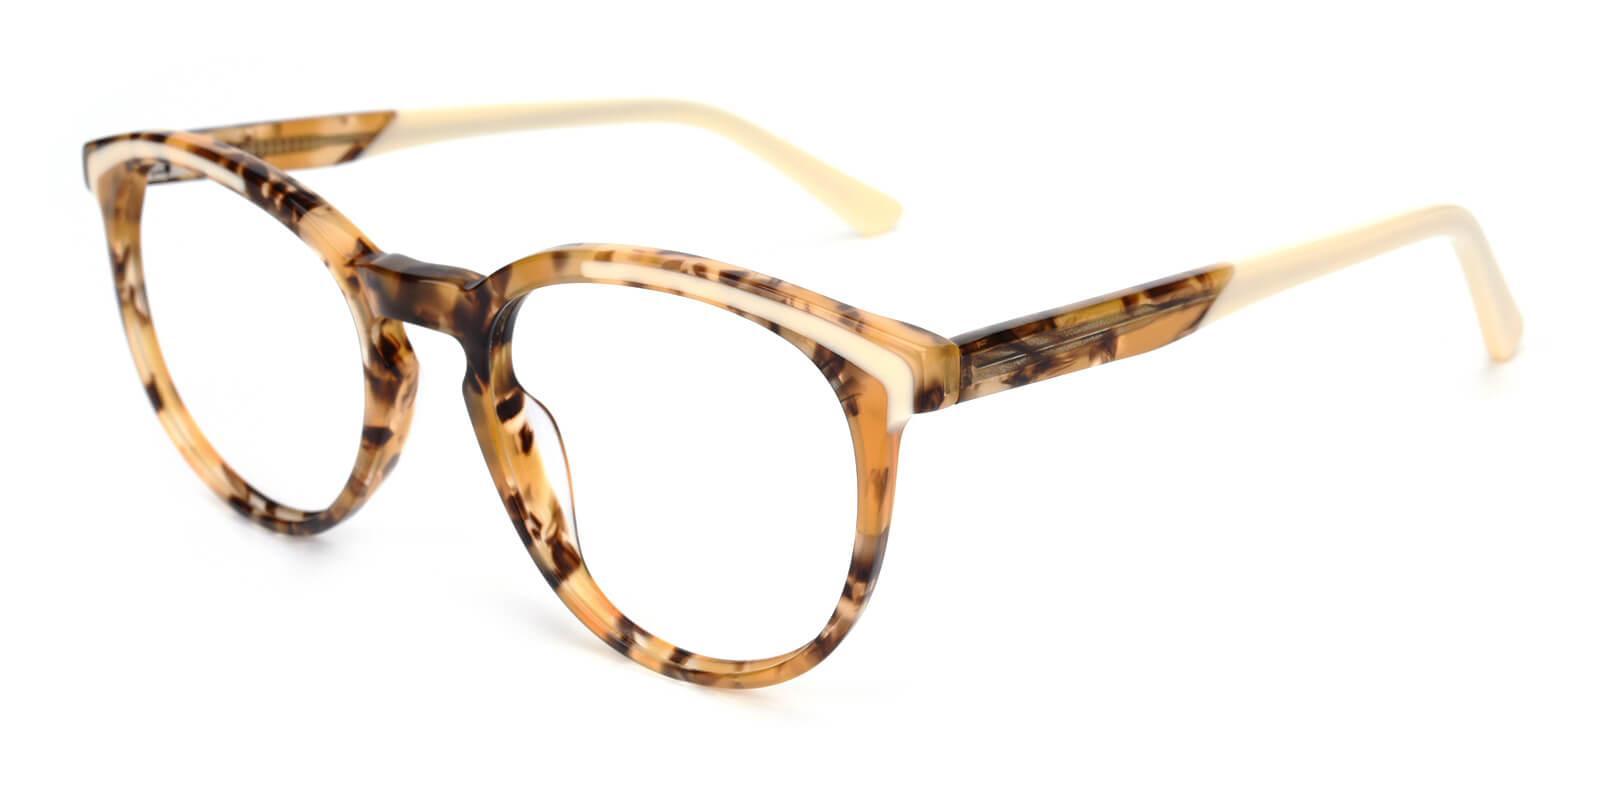 Deborah-Yellow-Oval-Acetate-Eyeglasses-additional1